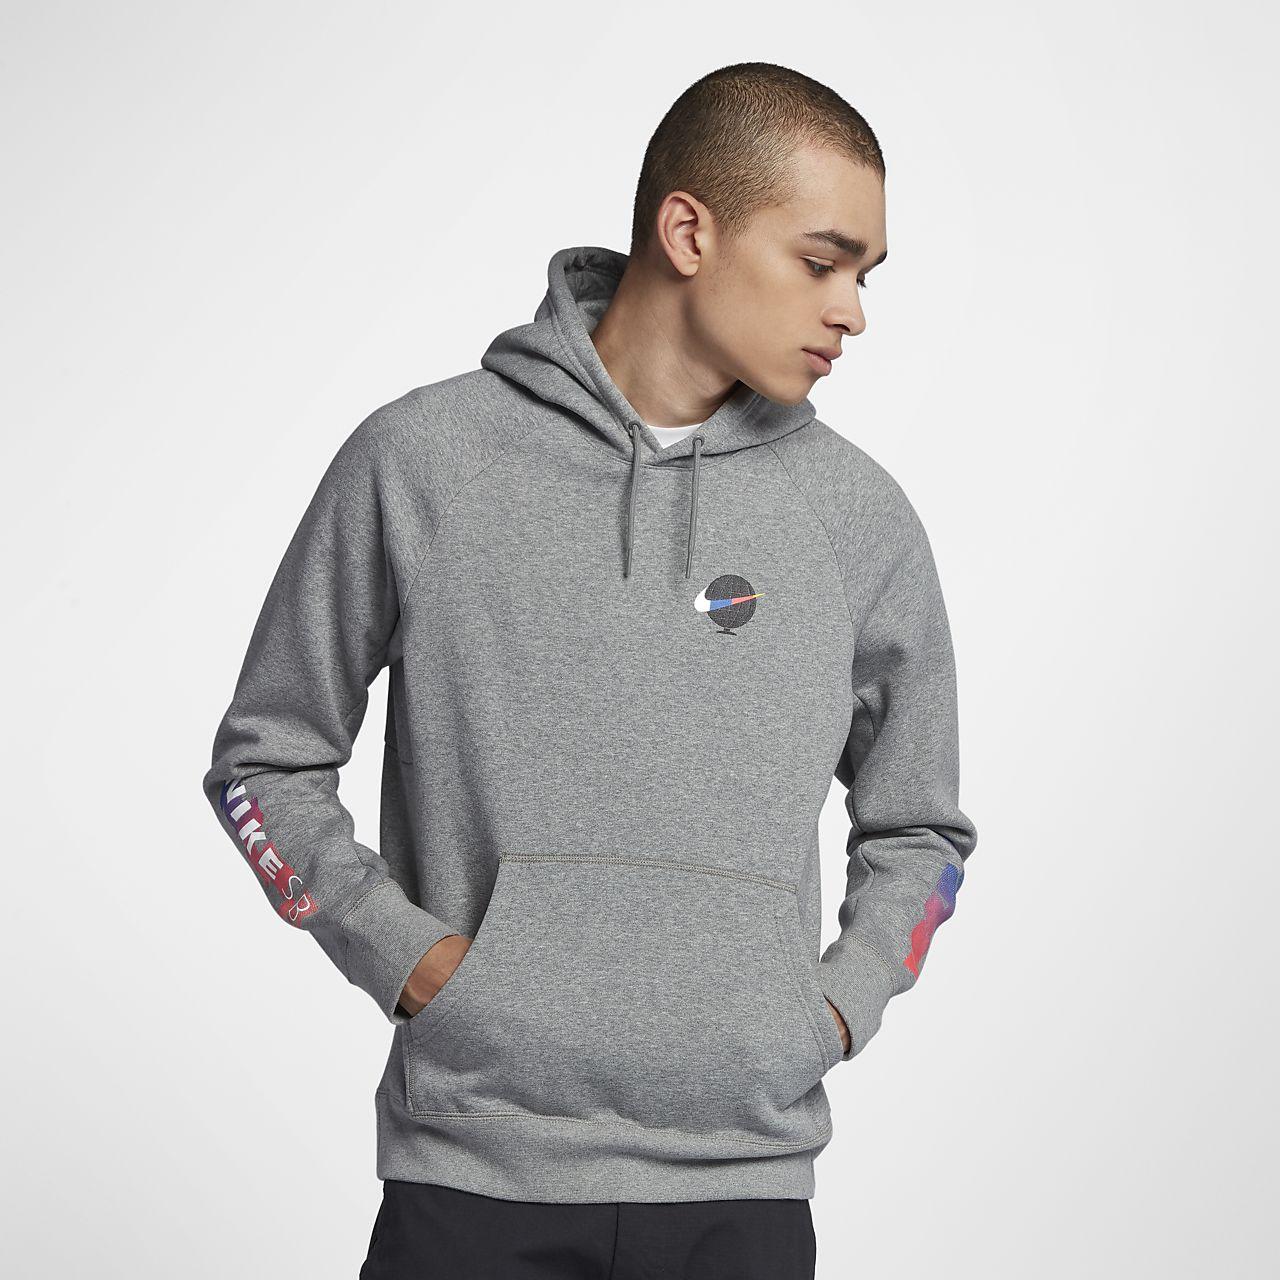 Mx Con Icon Hombre Capucha Para Sb Nike Sudadera 0qUgSq